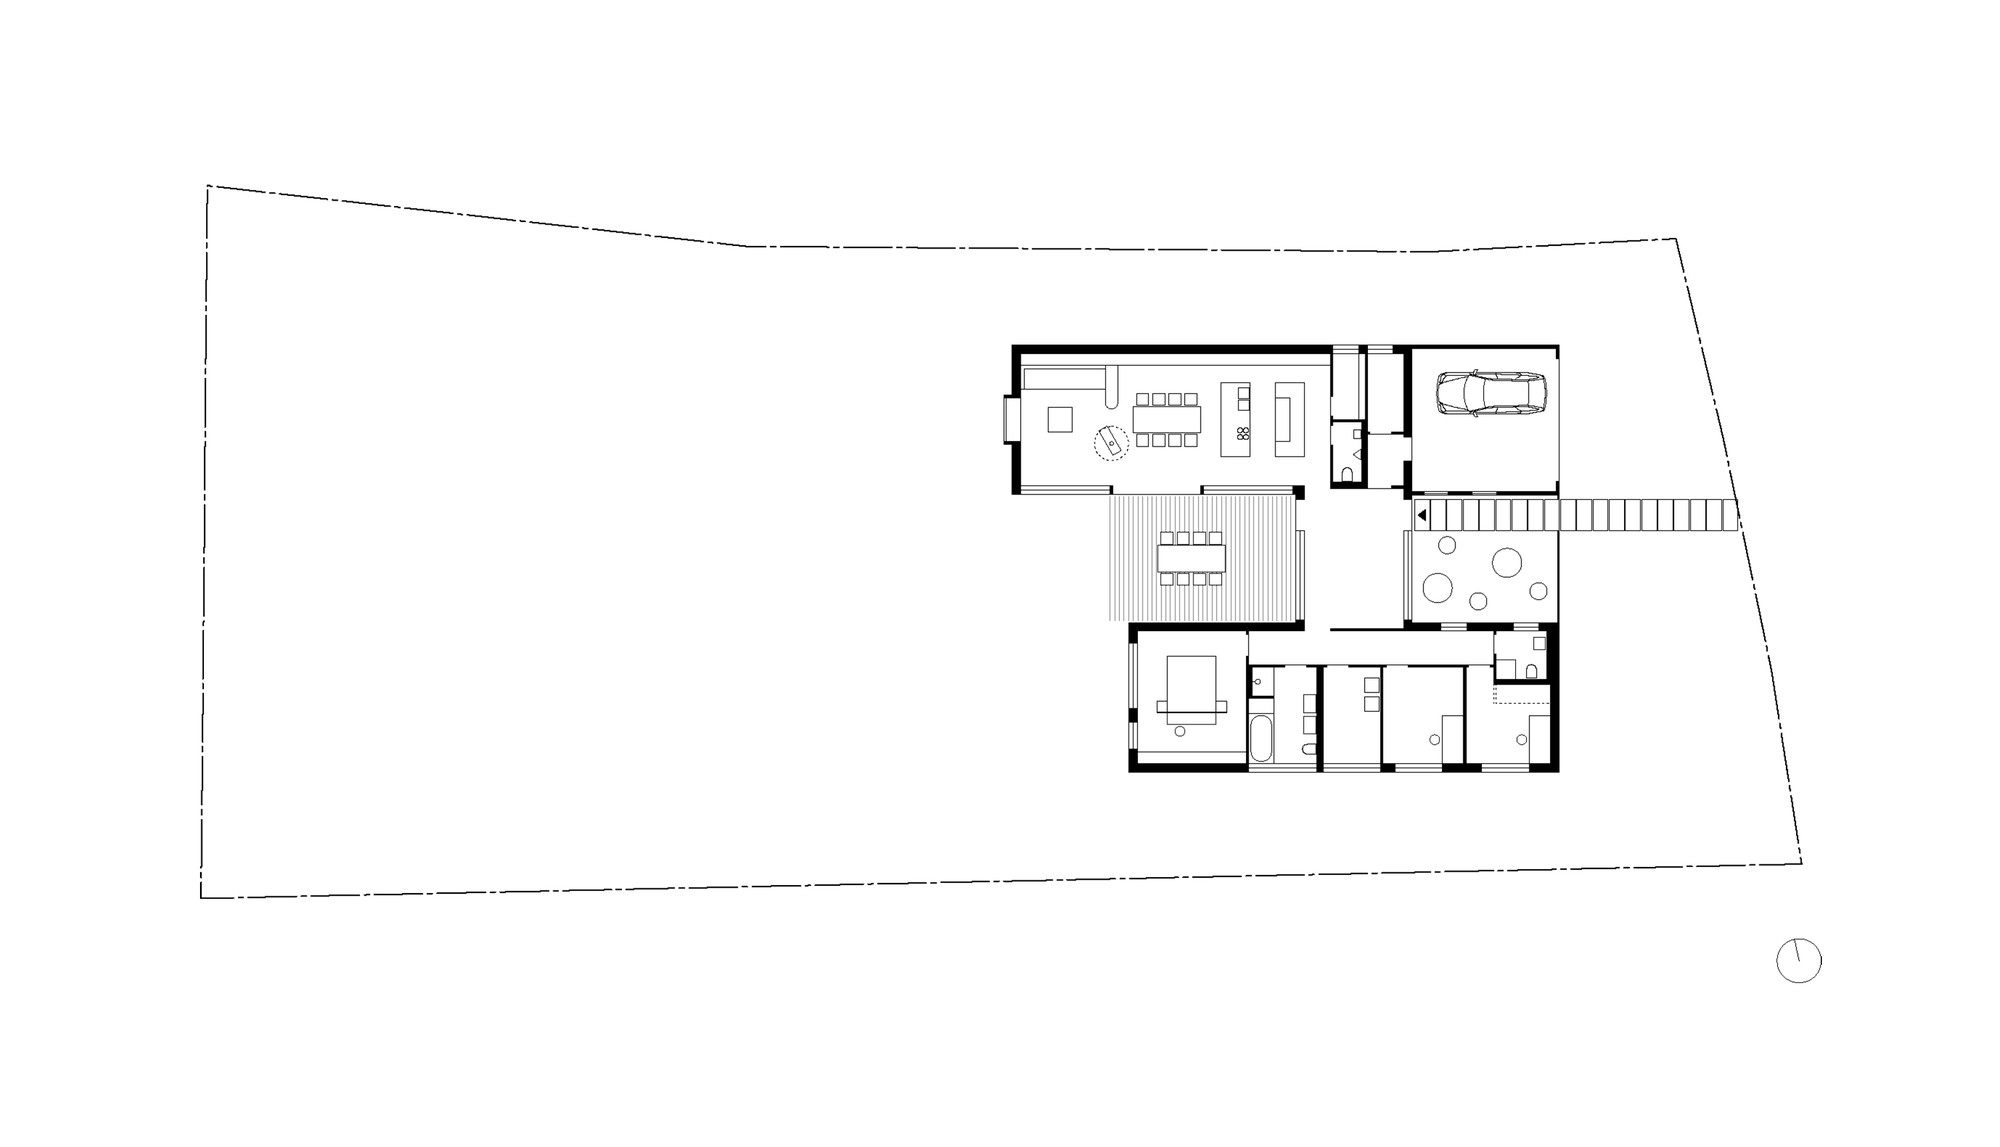 Gallery of Timber House KHNLEIN Architektur 11